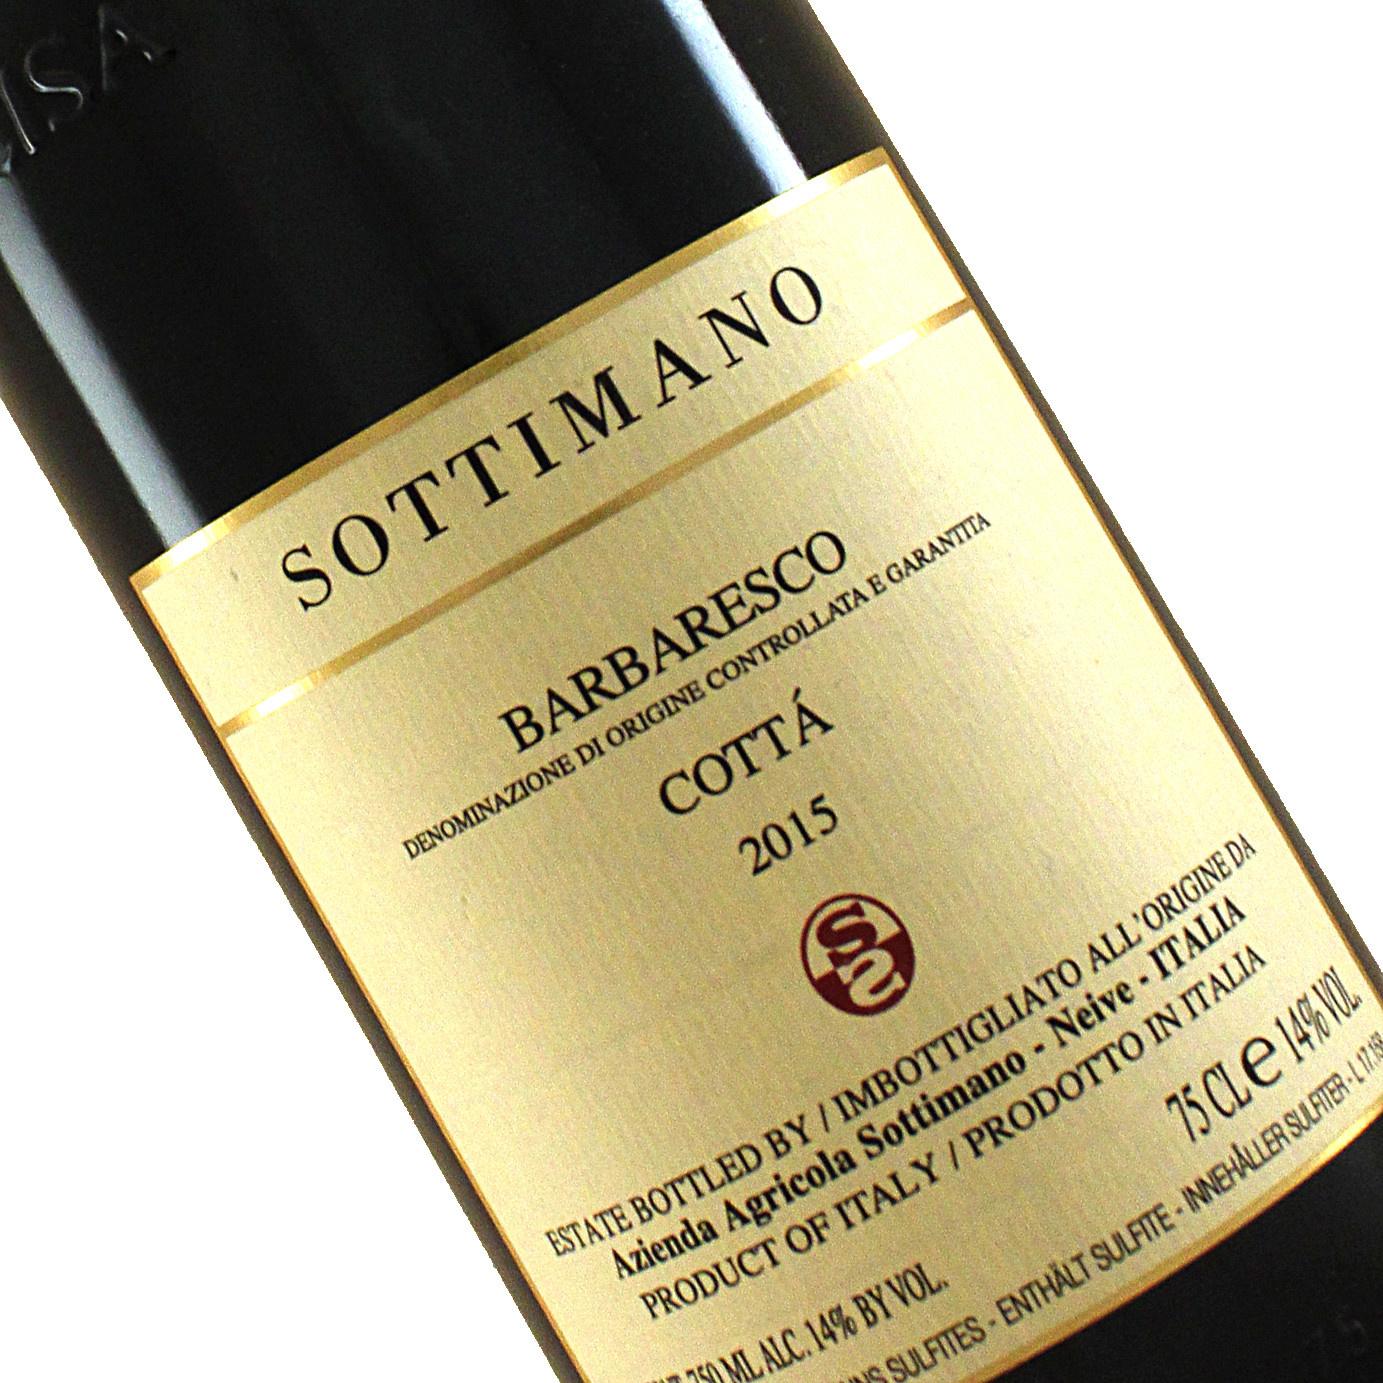 Sottimano 2015 Barbaresco Cotta, Piedmont, Italy